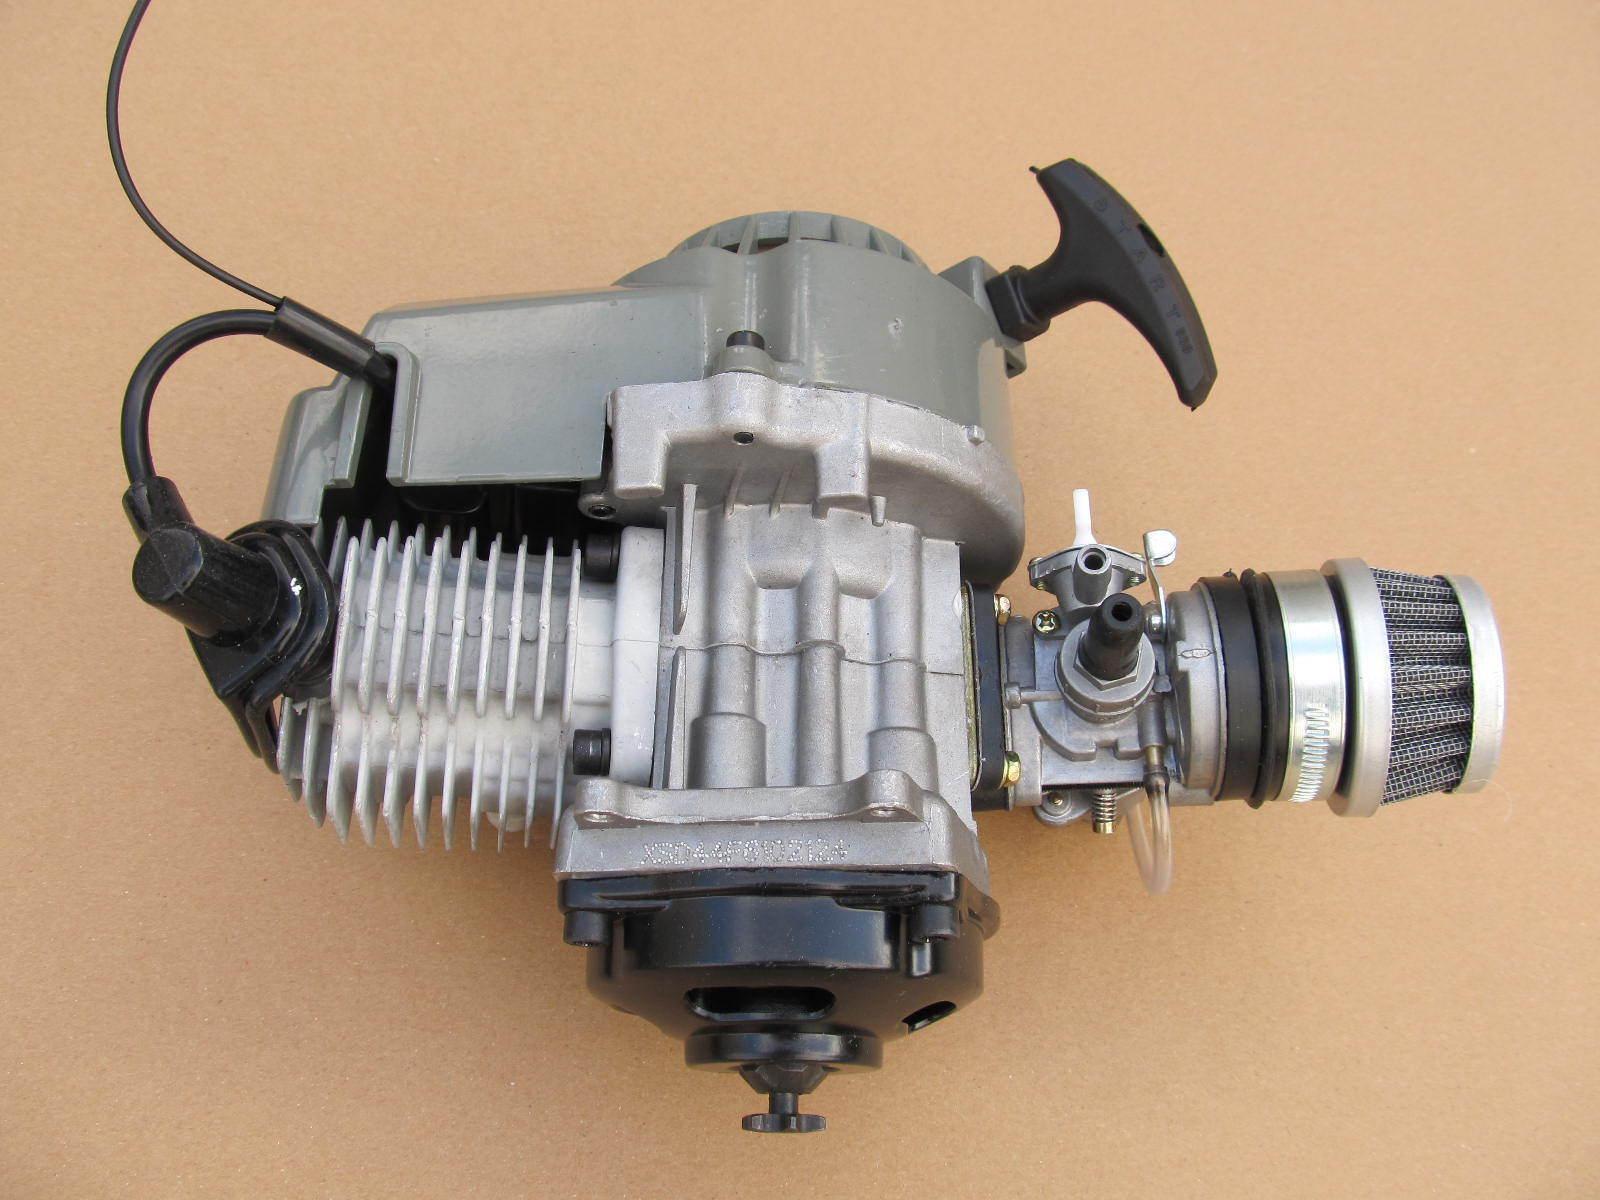 Mini quad quadard bike minimoto mini engine EASY START system 49cc 2 stroke